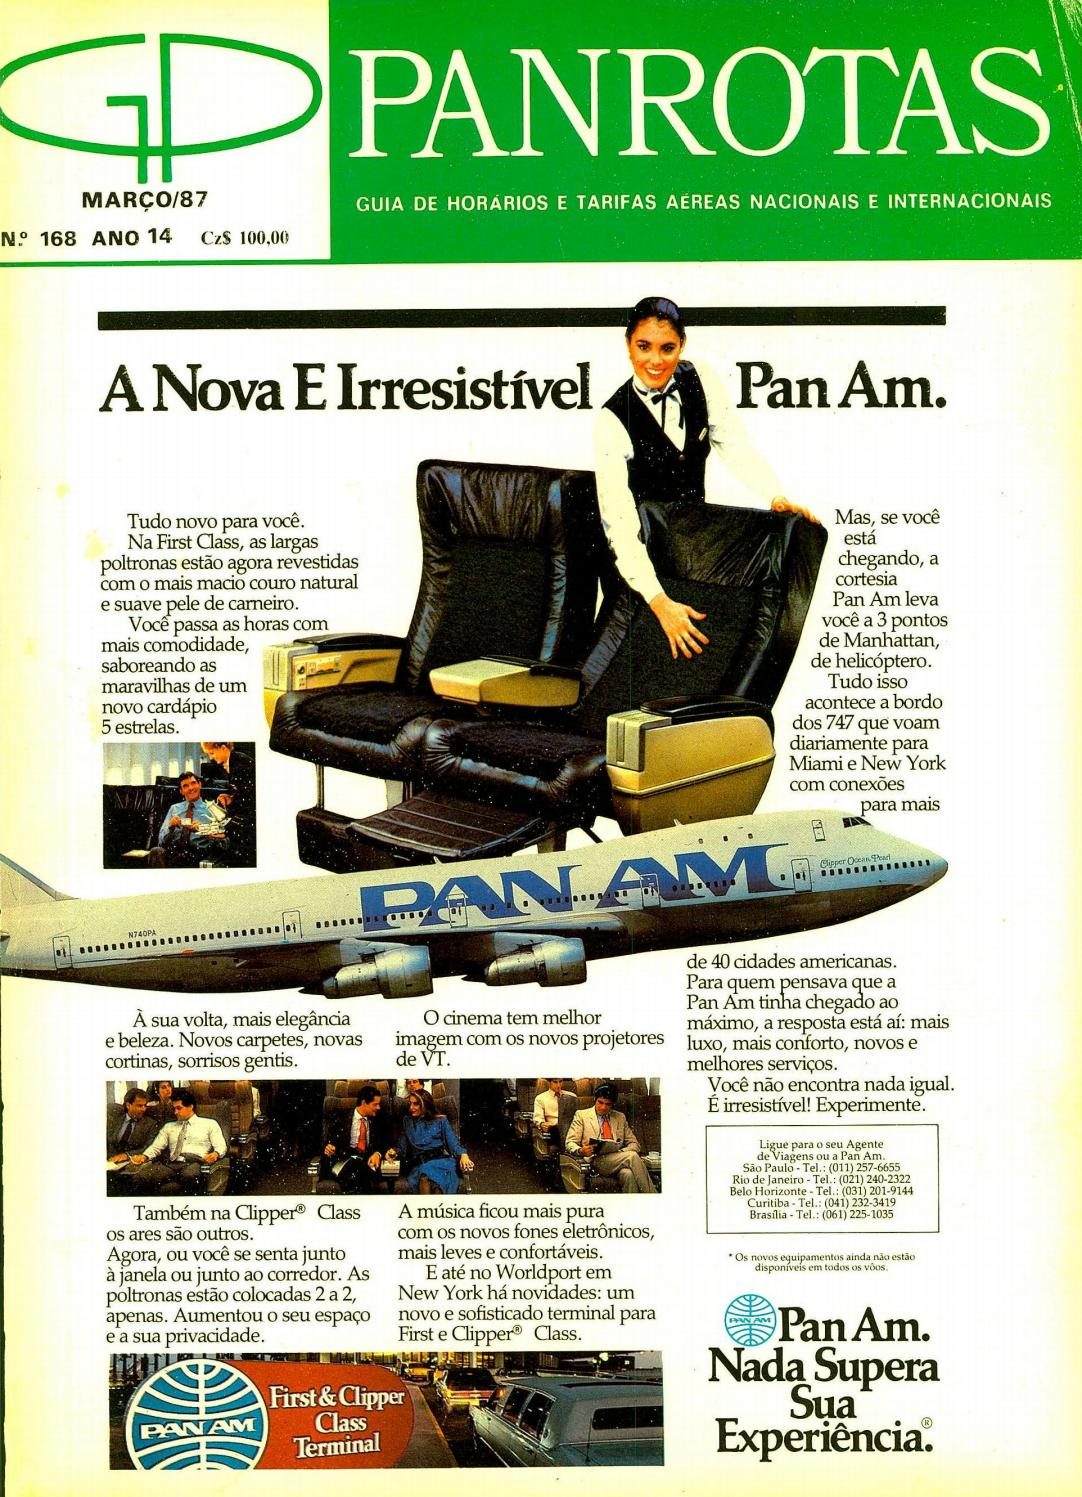 afb28e6c4c4f3 Guia PANROTAS - Edição 168 - Março 1987 by PANROTAS Editora - issuu